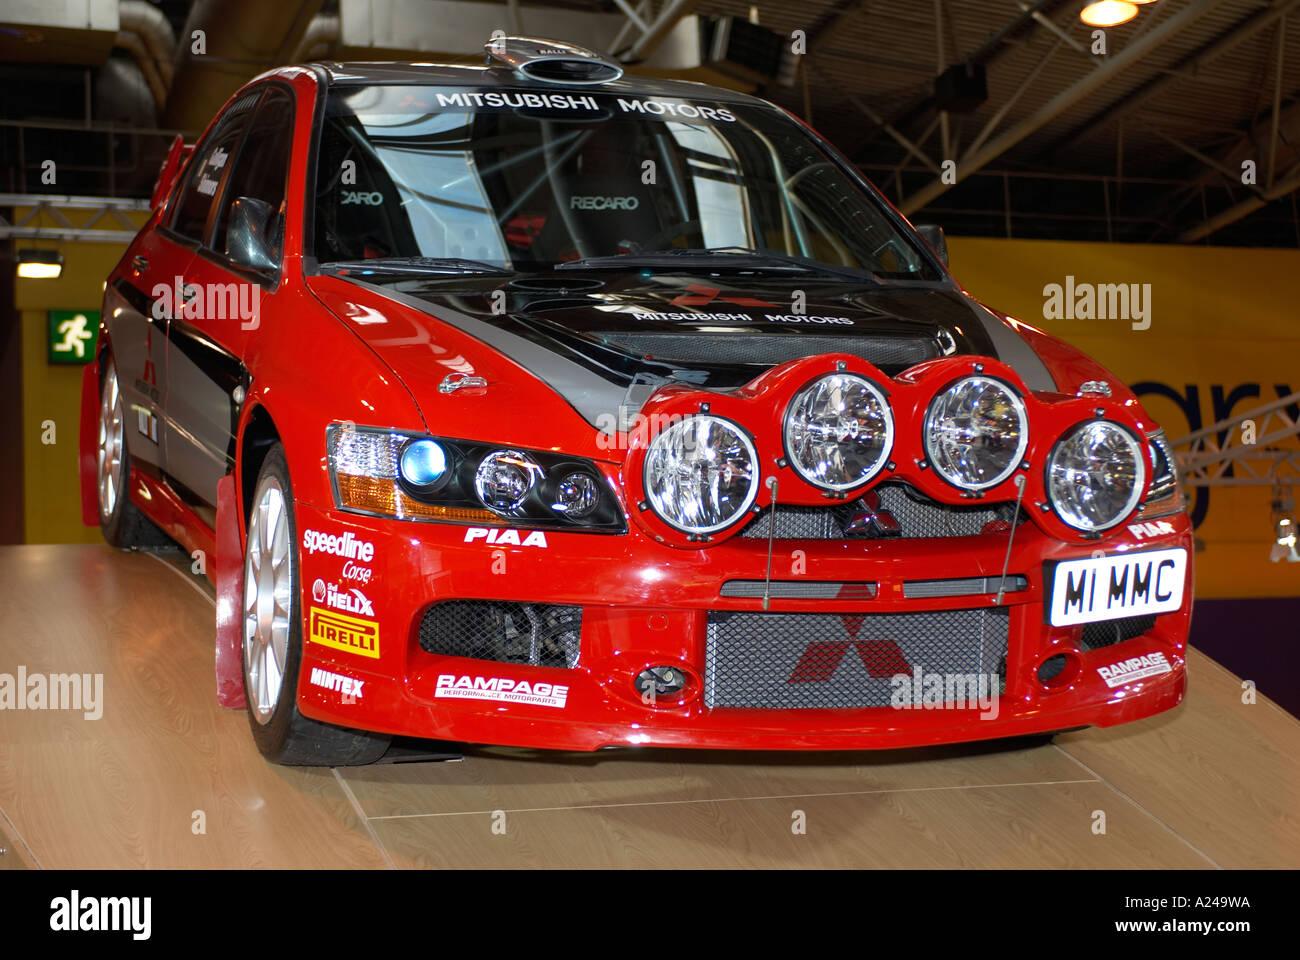 Mitsubishi Lancer Evo rally car, Autosport show 2006 Stock Photo ...